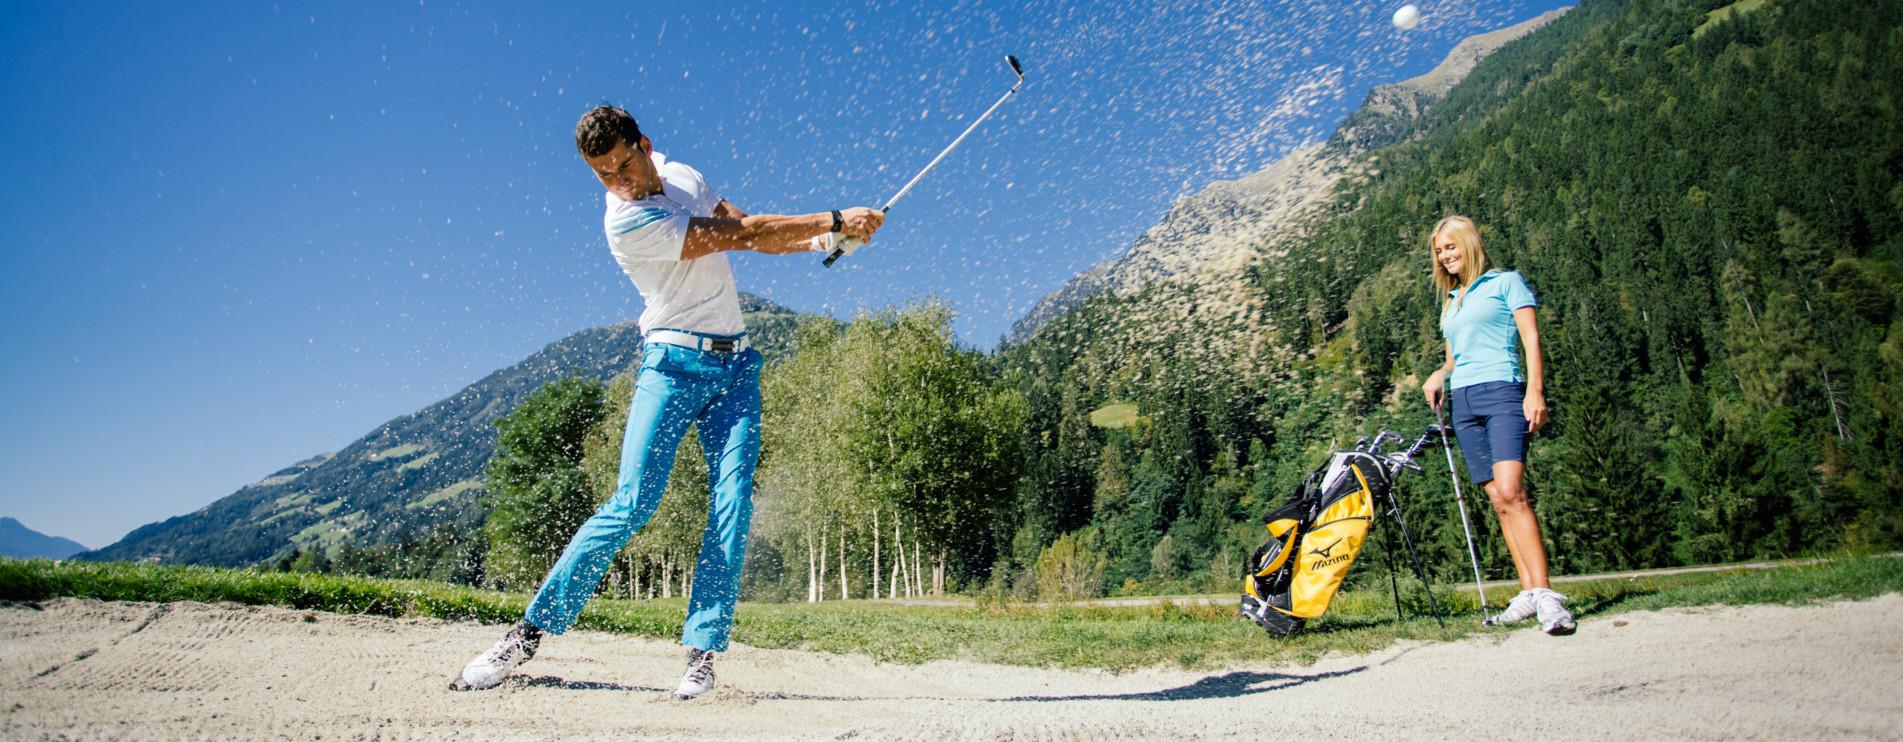 Golf resort andreus merano val passiria alto adige